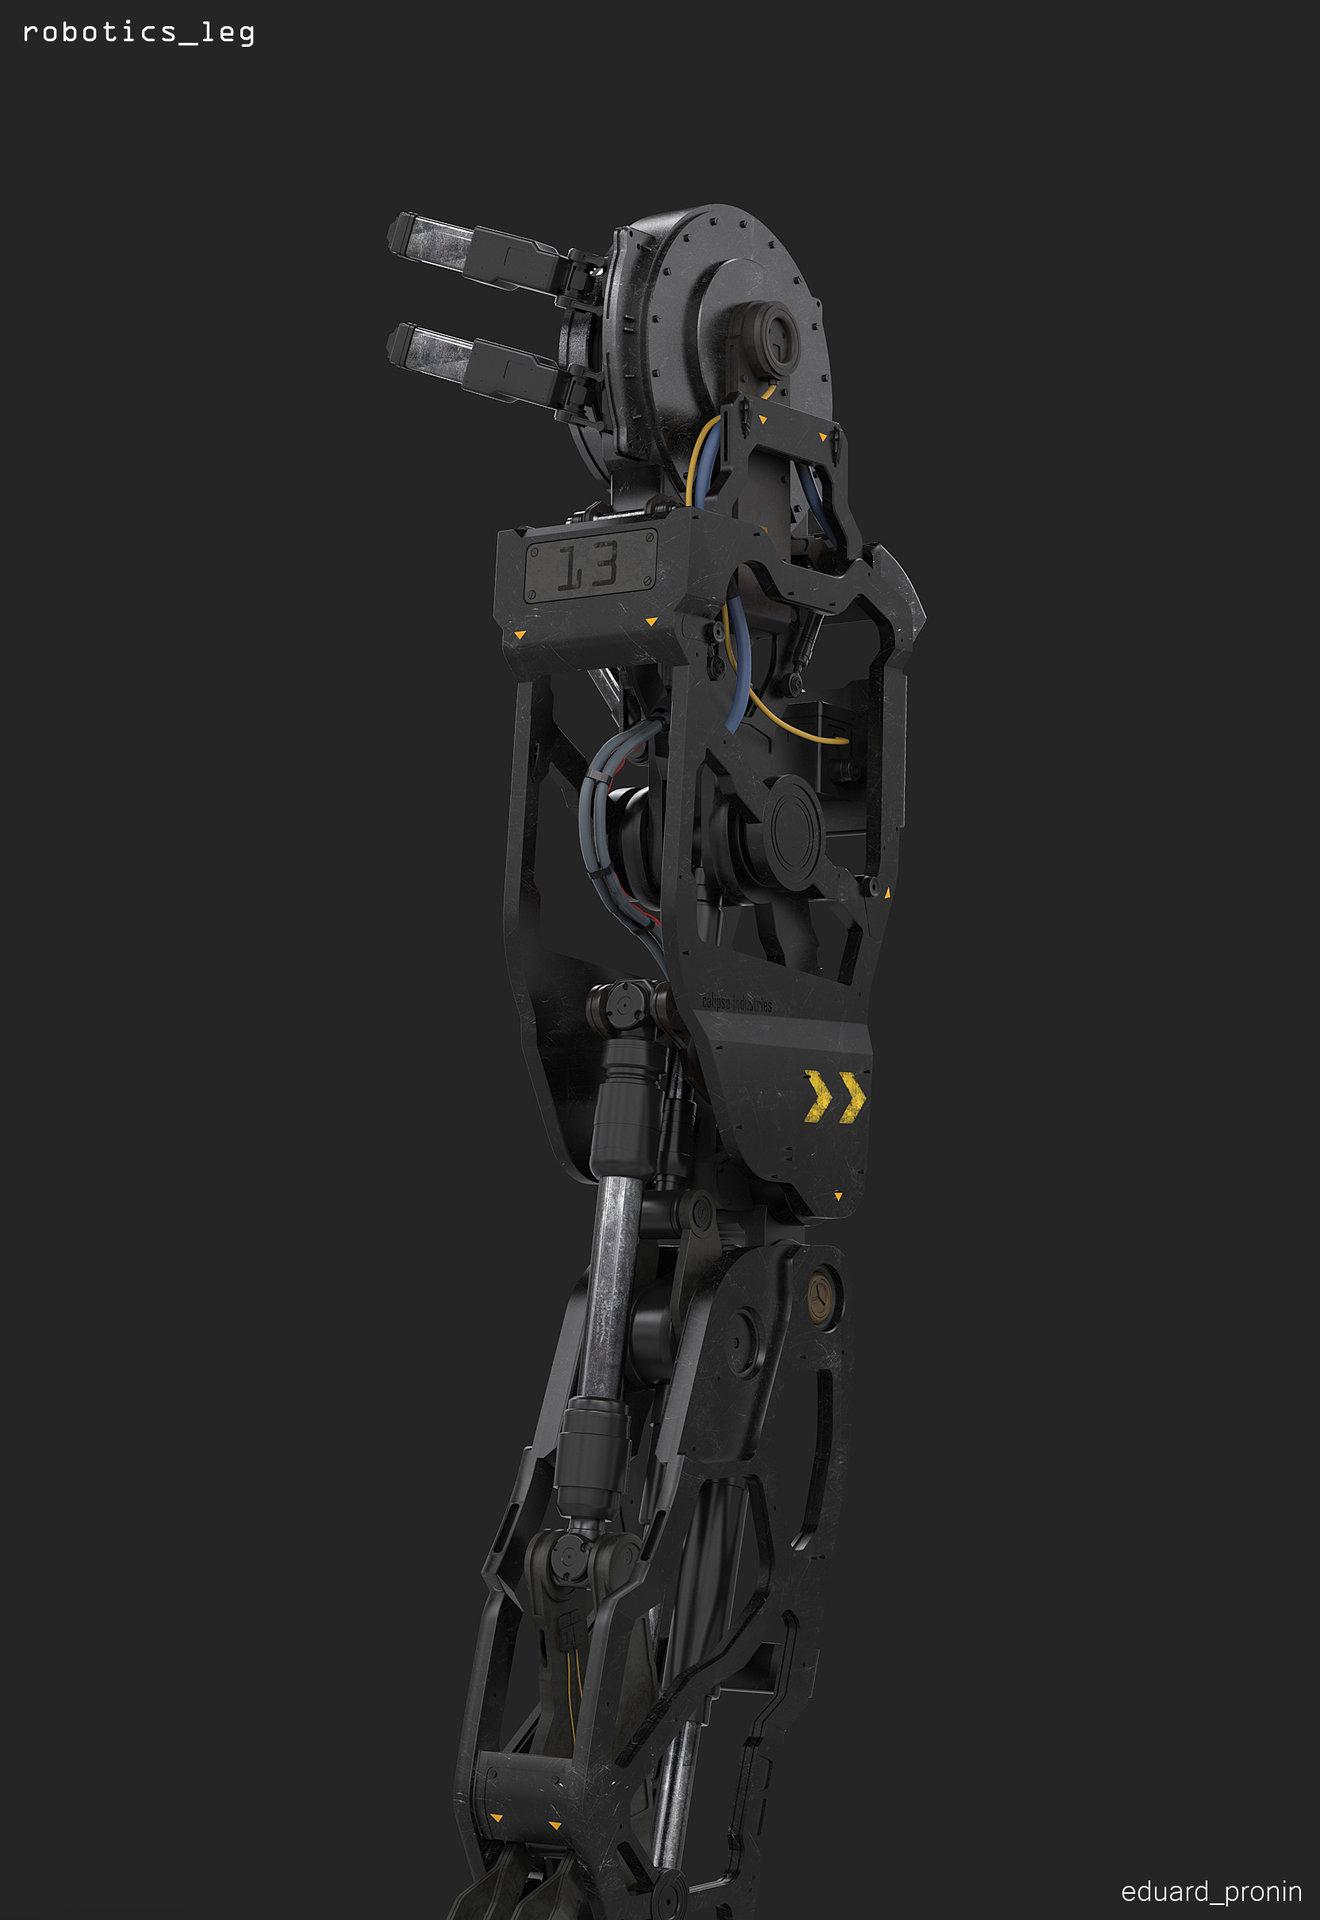 Eduard pronin leg texture2